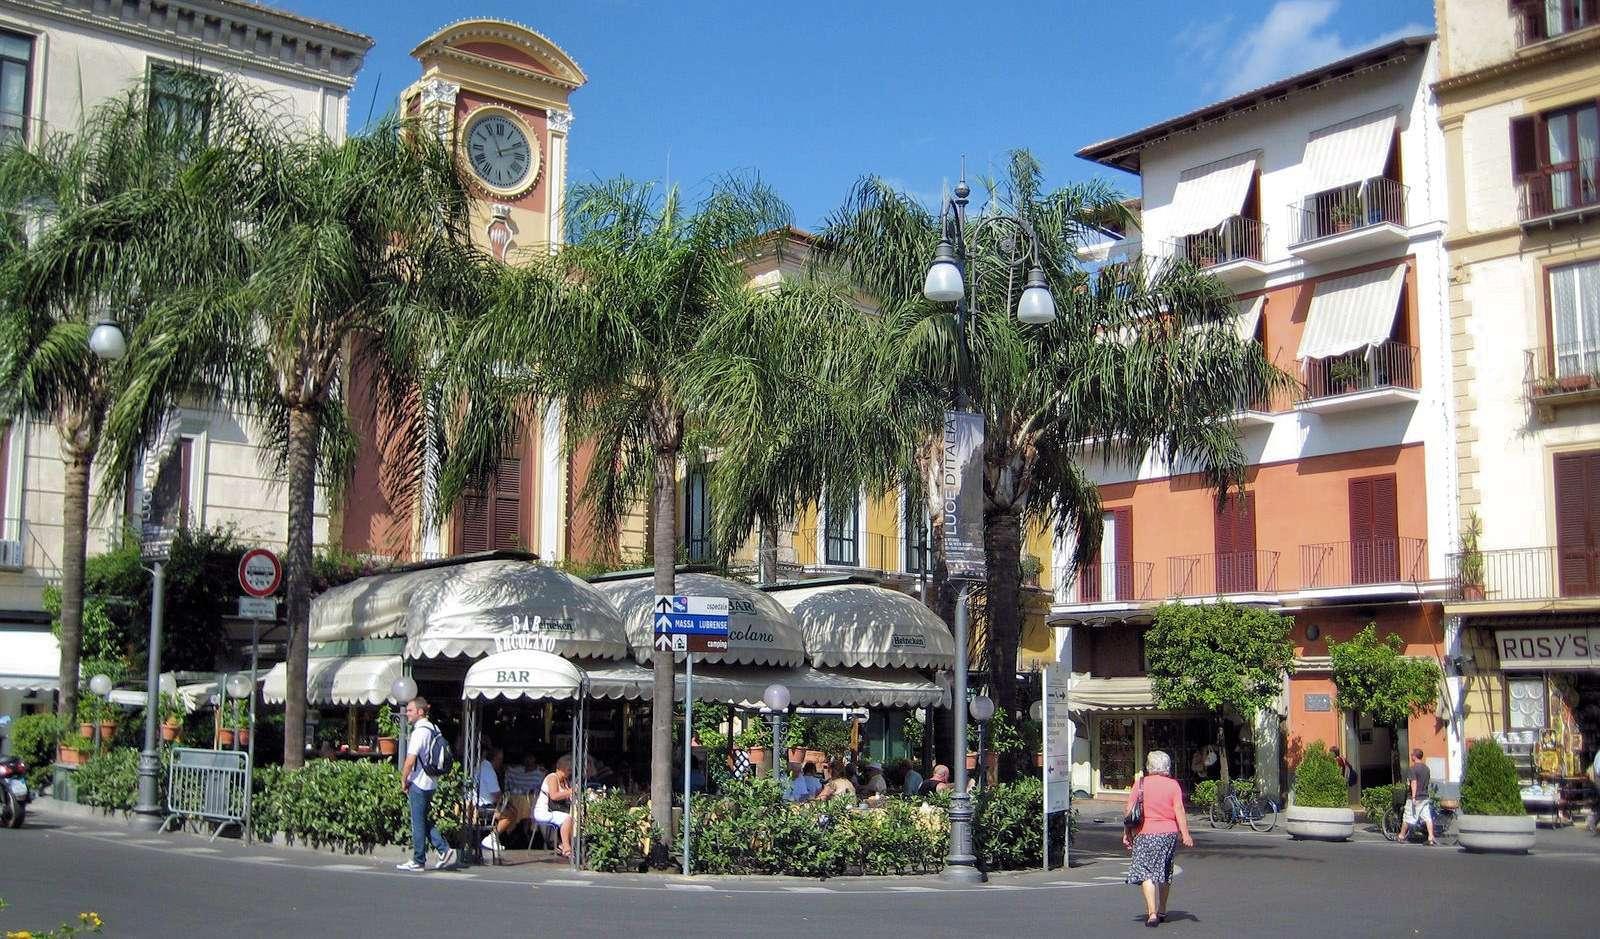 Den centrale plads Piazza Tasso